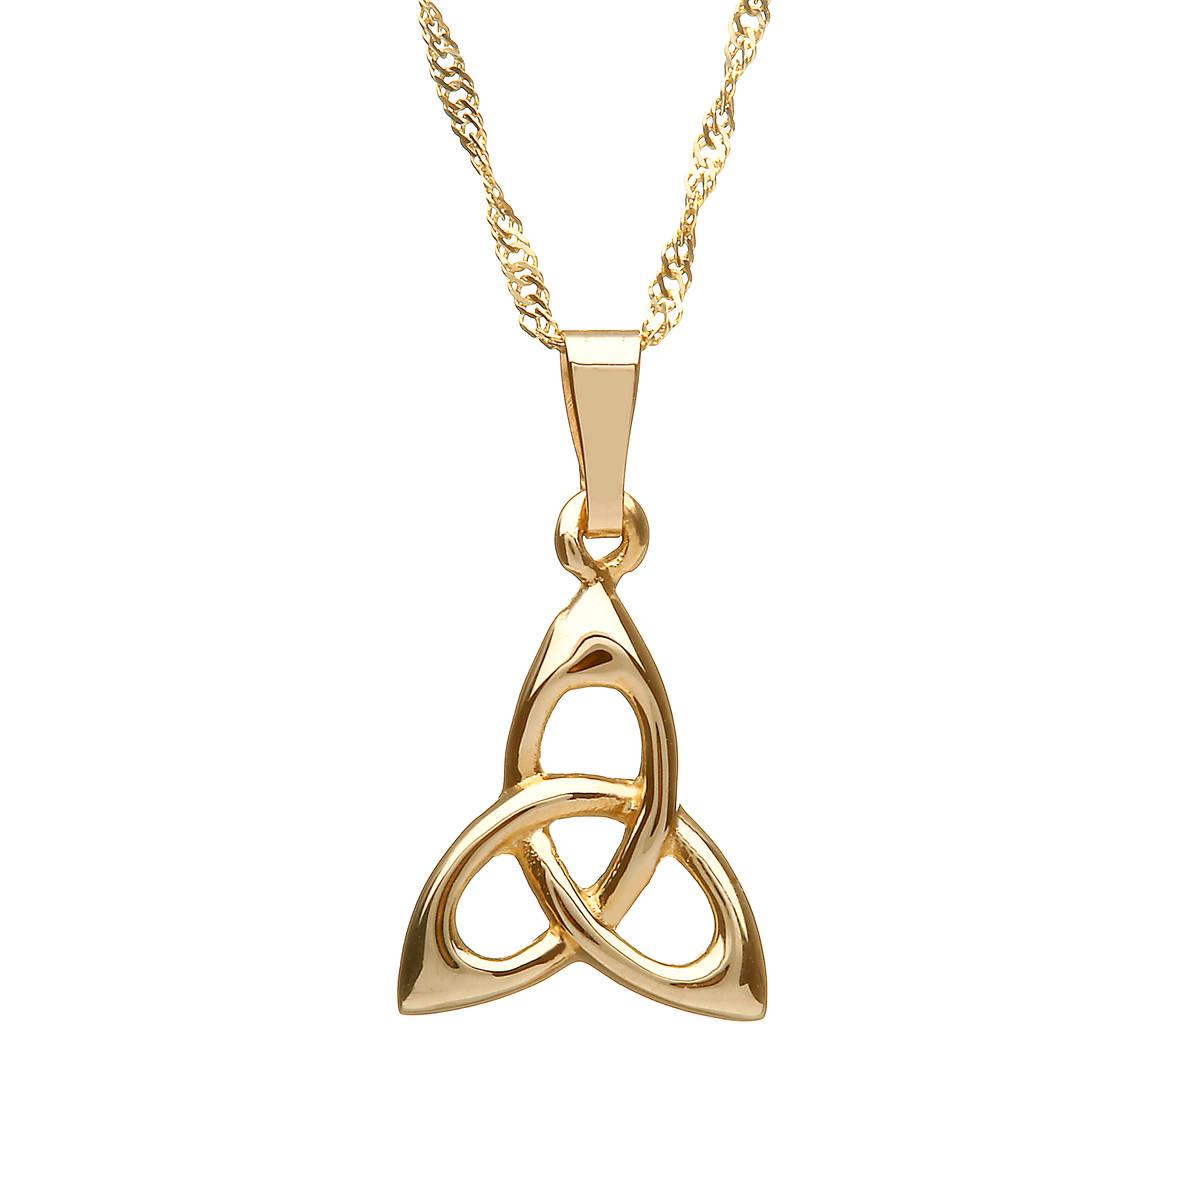 "10 carat Yellow Gold Trinity Knot Pendant On 18"" Chain"